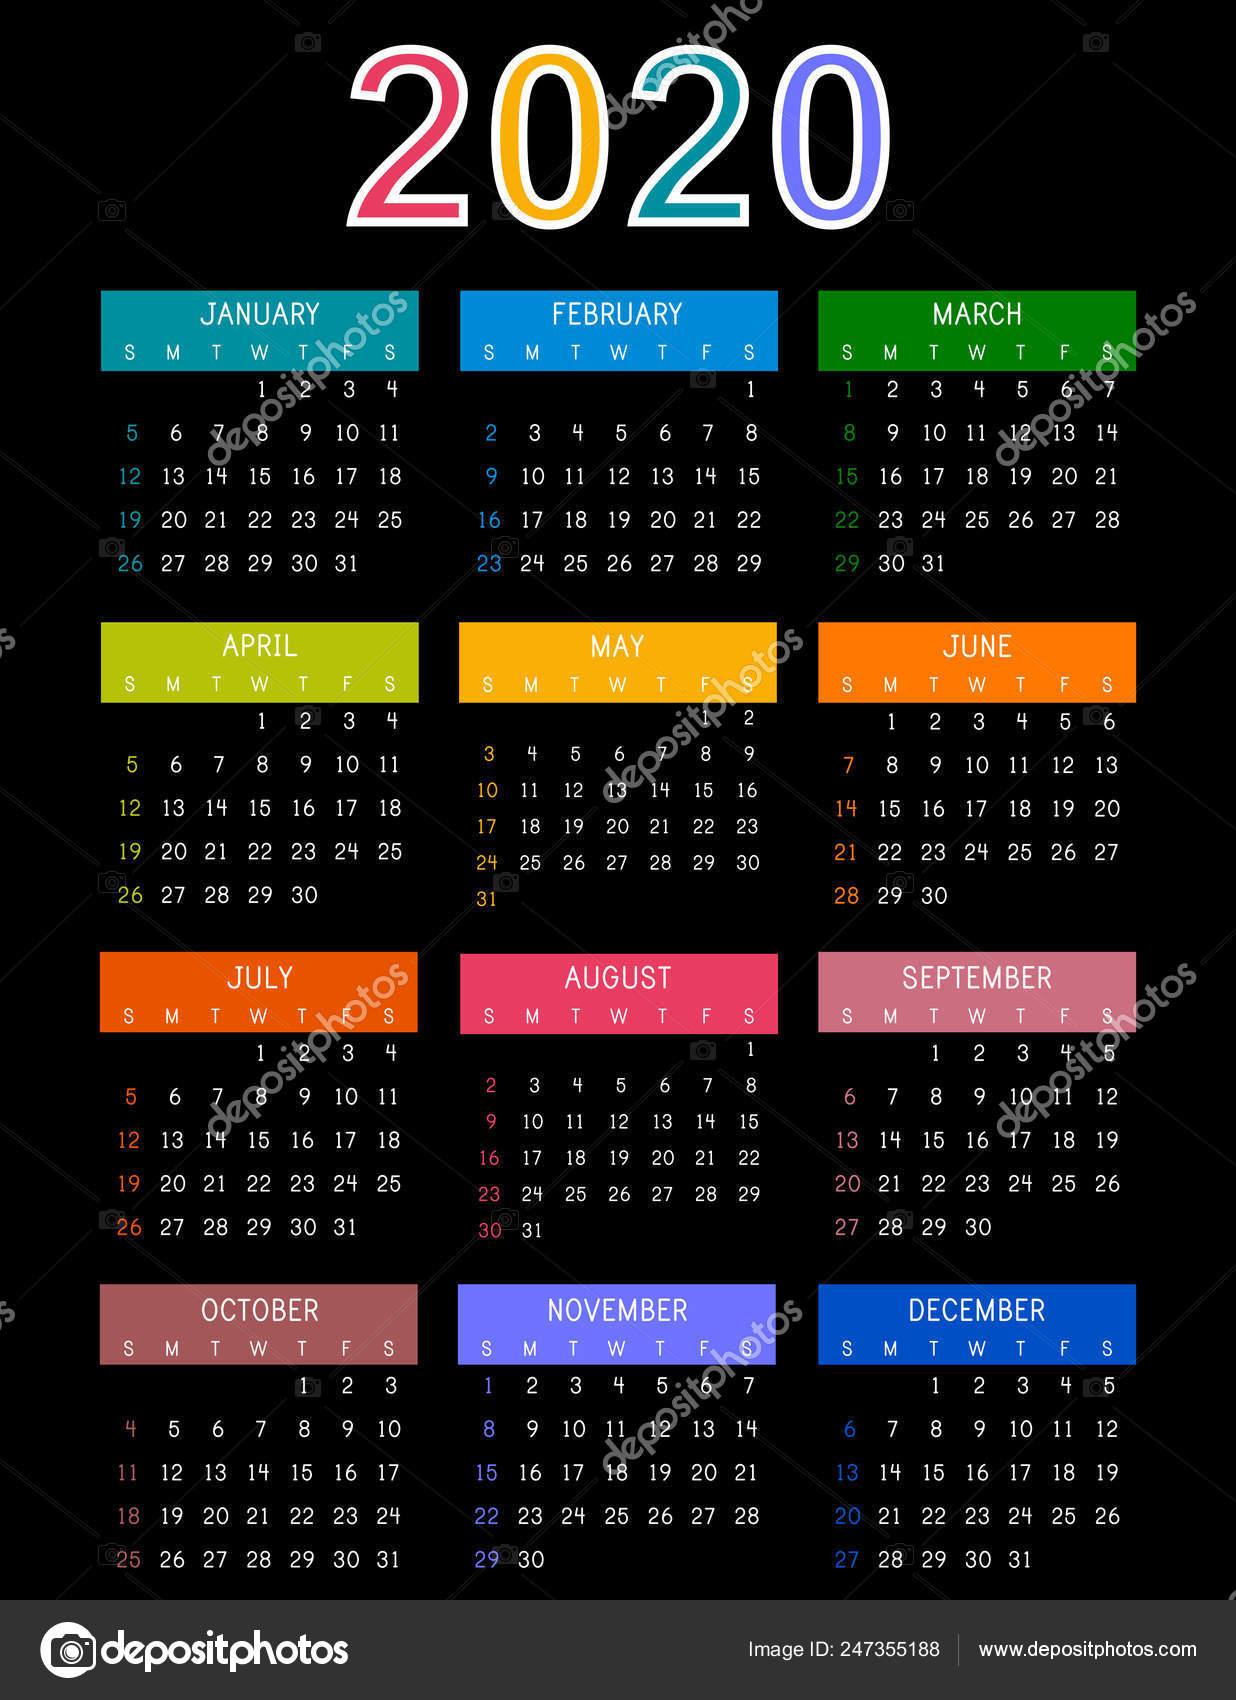 Modele De Calendrier 2020.Calendrier 2020 Sur Fond Sombre Calendrier Colore Annee 2020